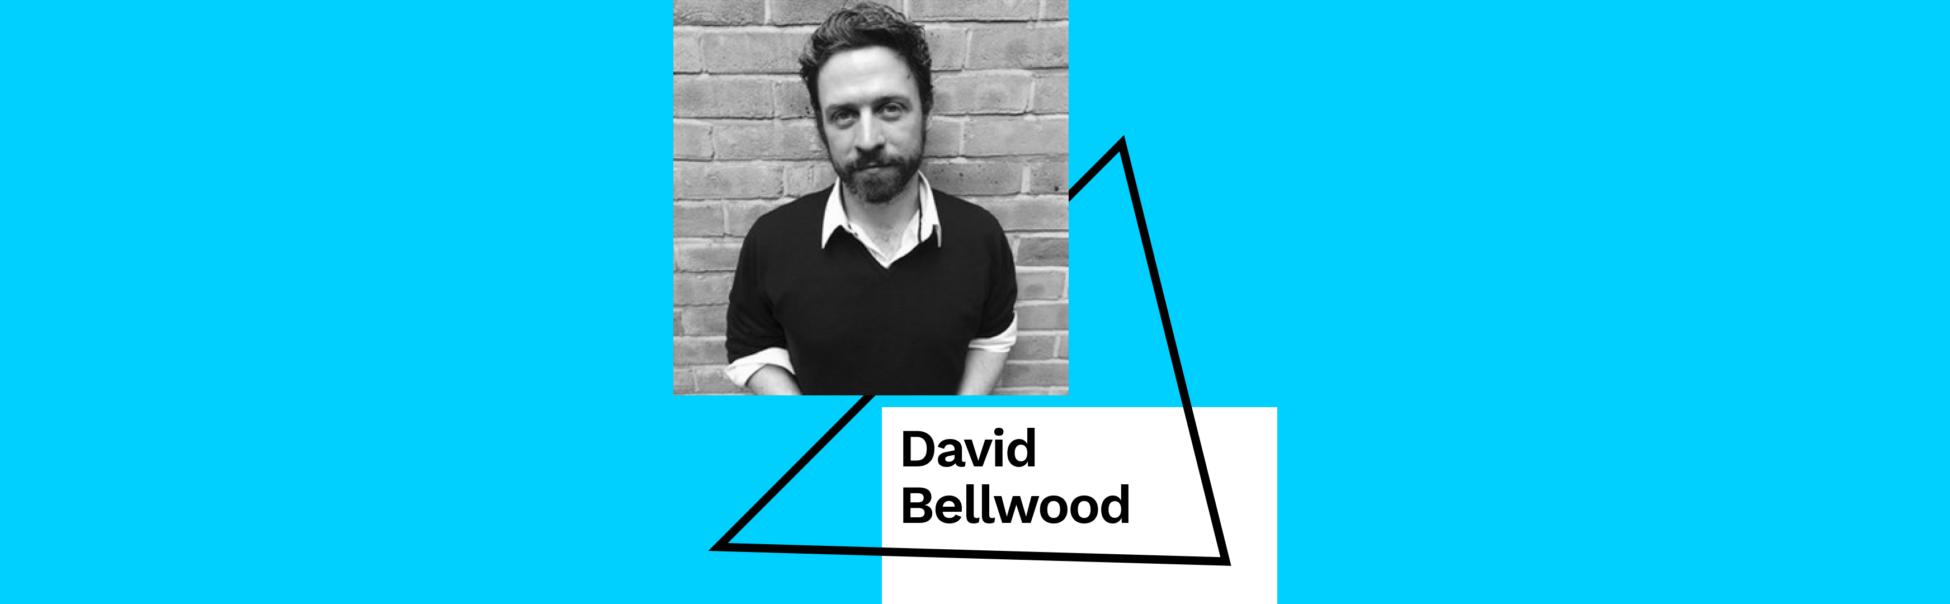 David Bellwood